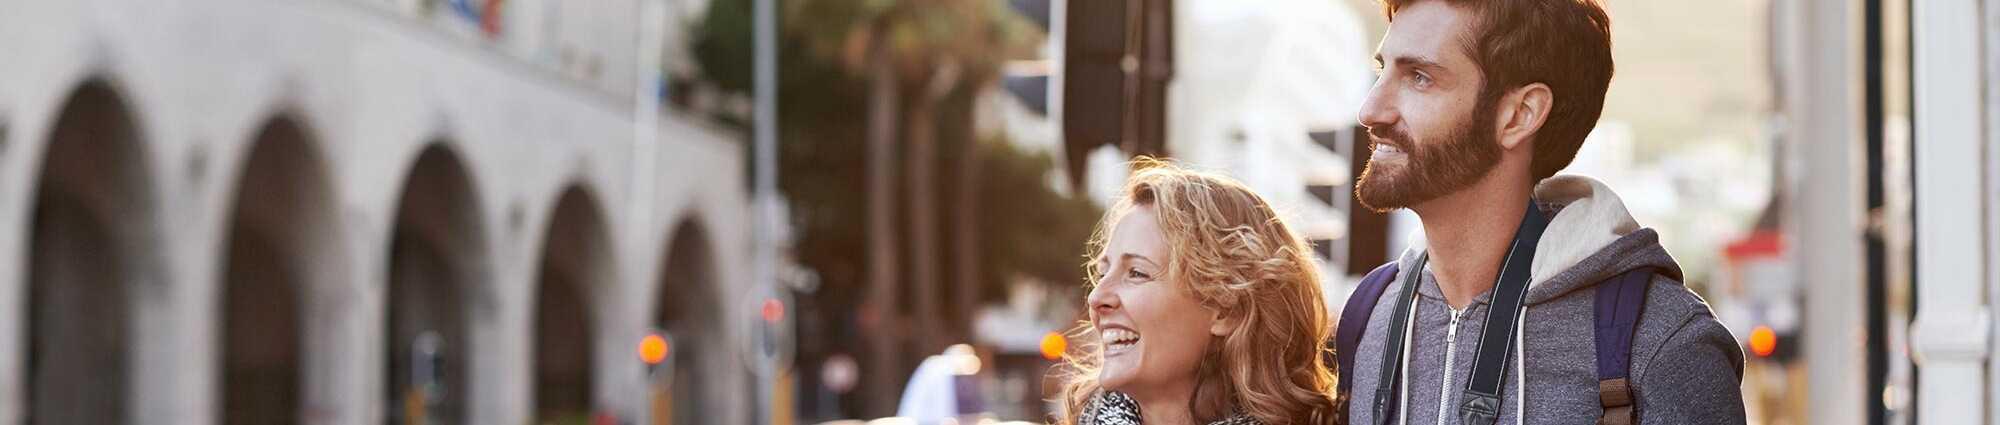 Historiske hotell i Norge